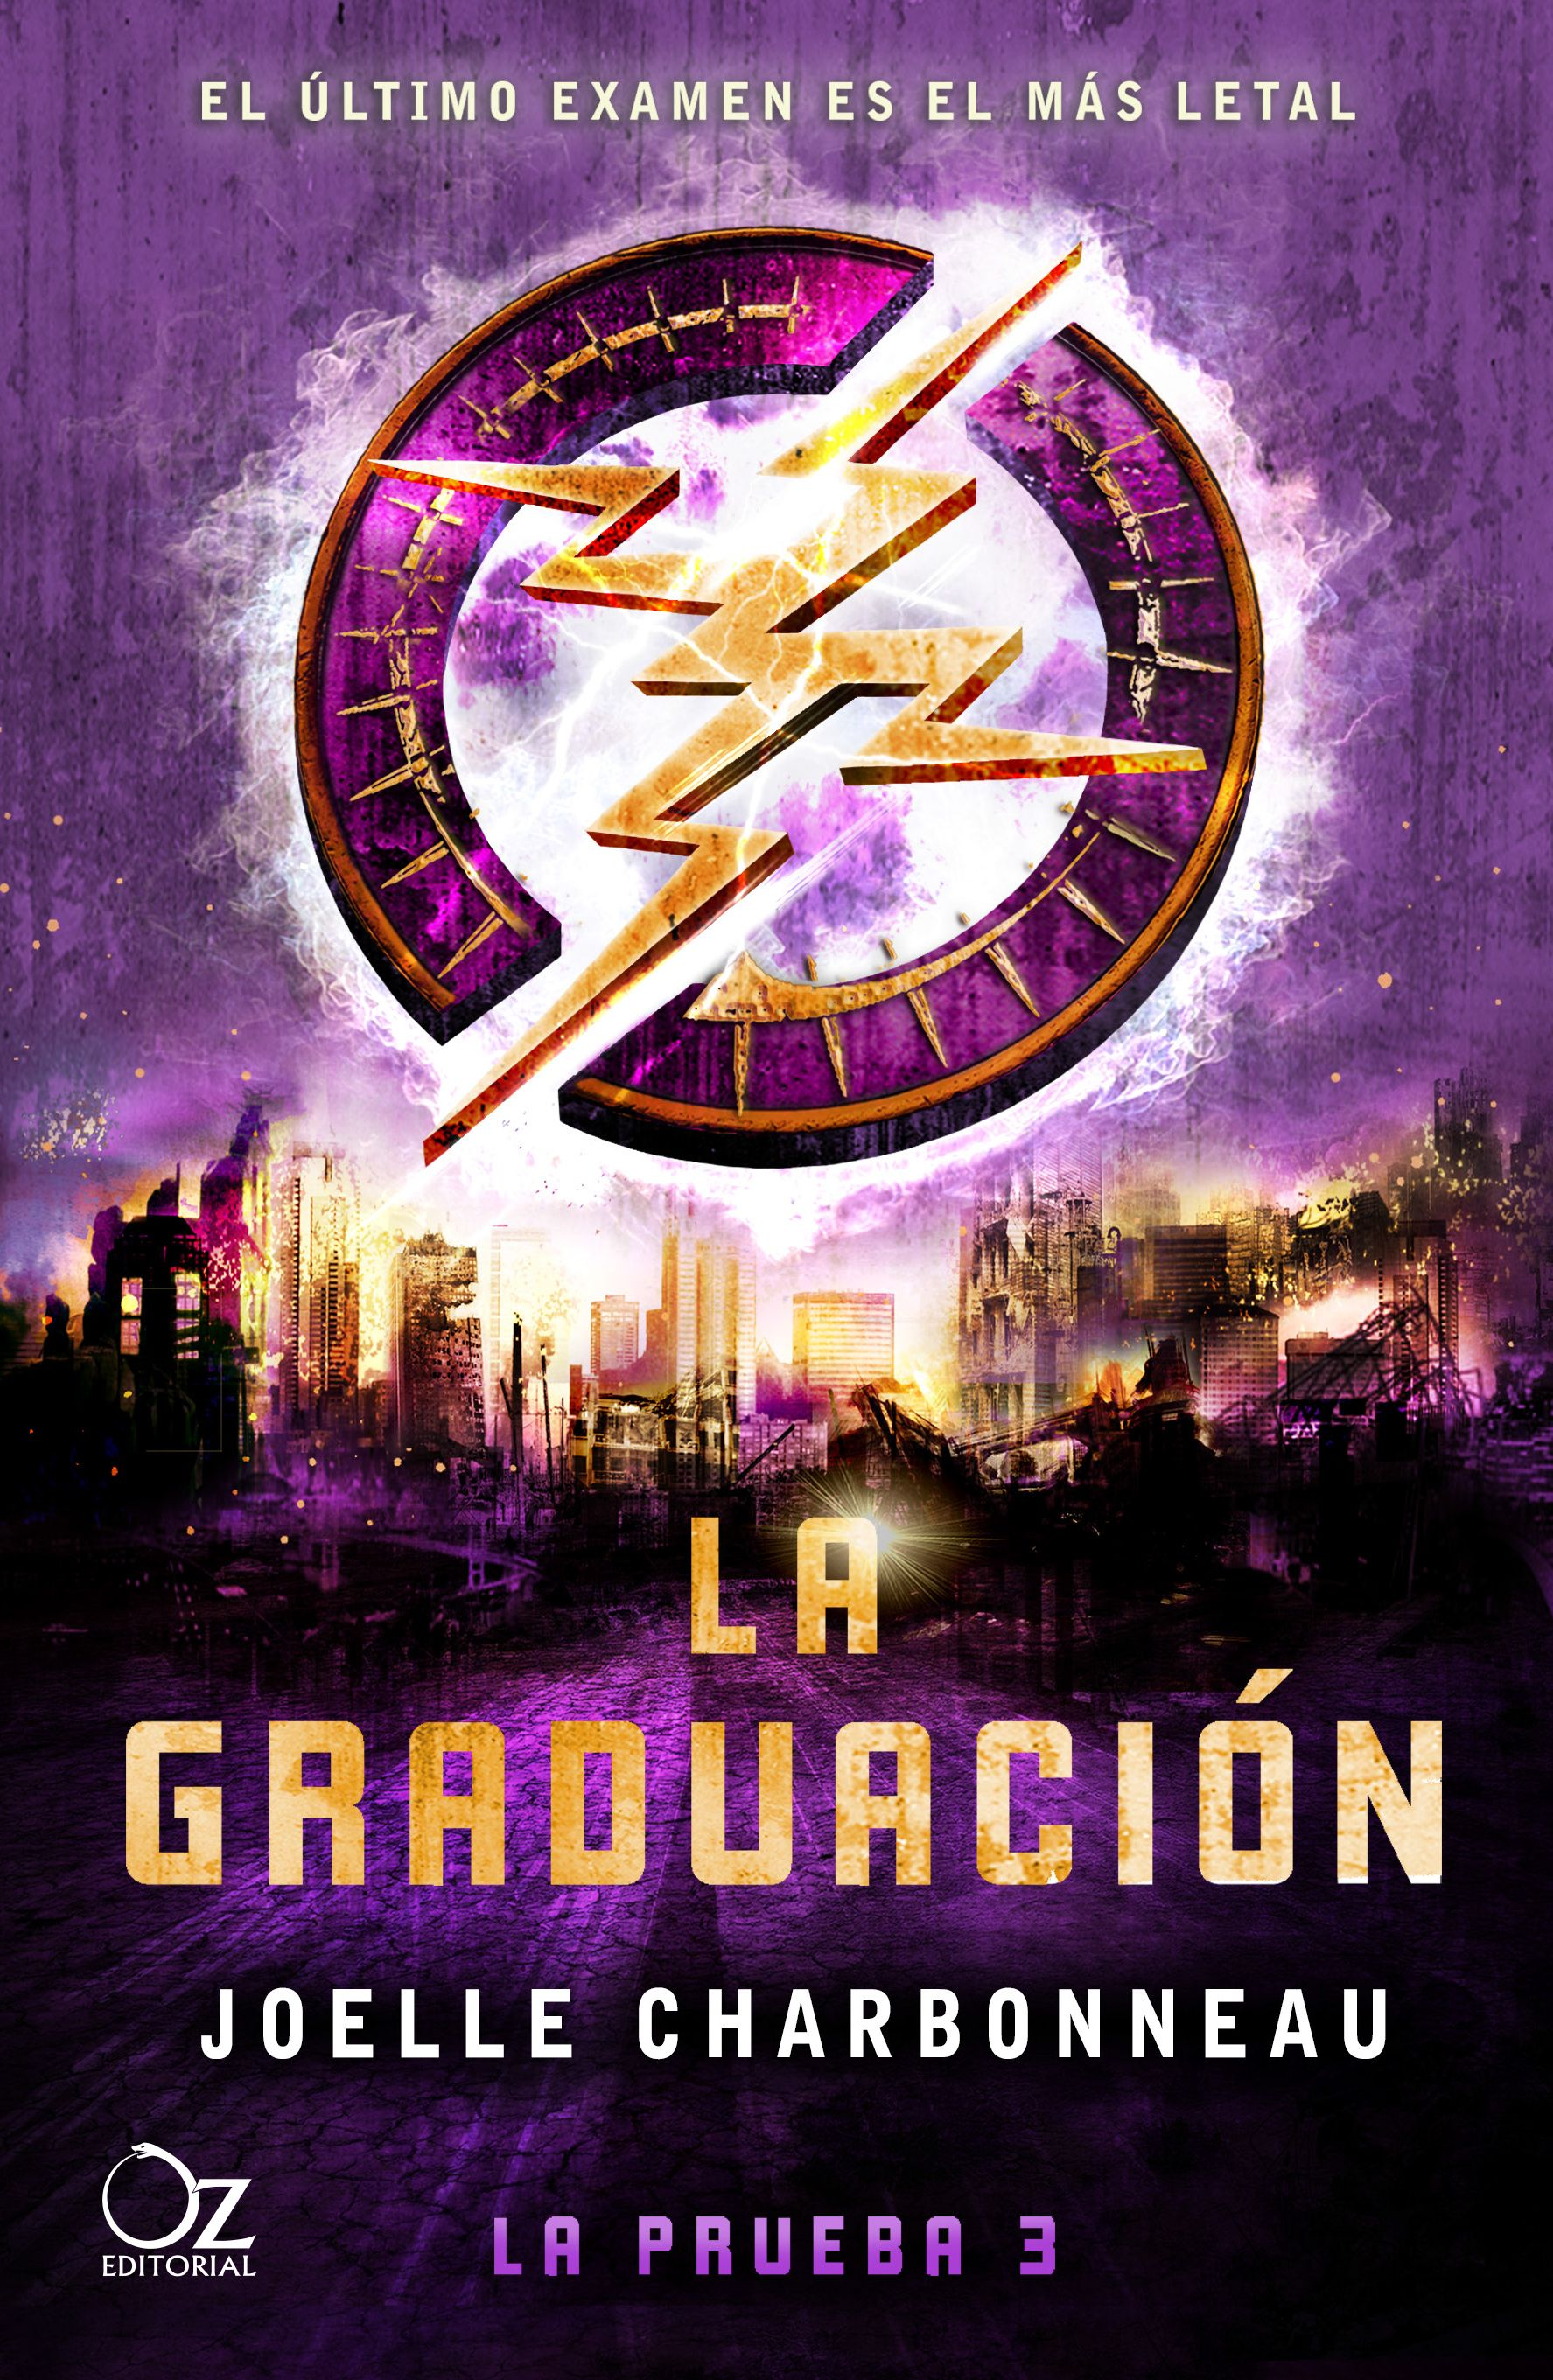 La Graduación La Prueba 3 Joelle Charbonneau Https Www Goodreads Com Book Show 26796866 La Graduaci Libros Para Leer Juveniles Literatura Juvenil Libros